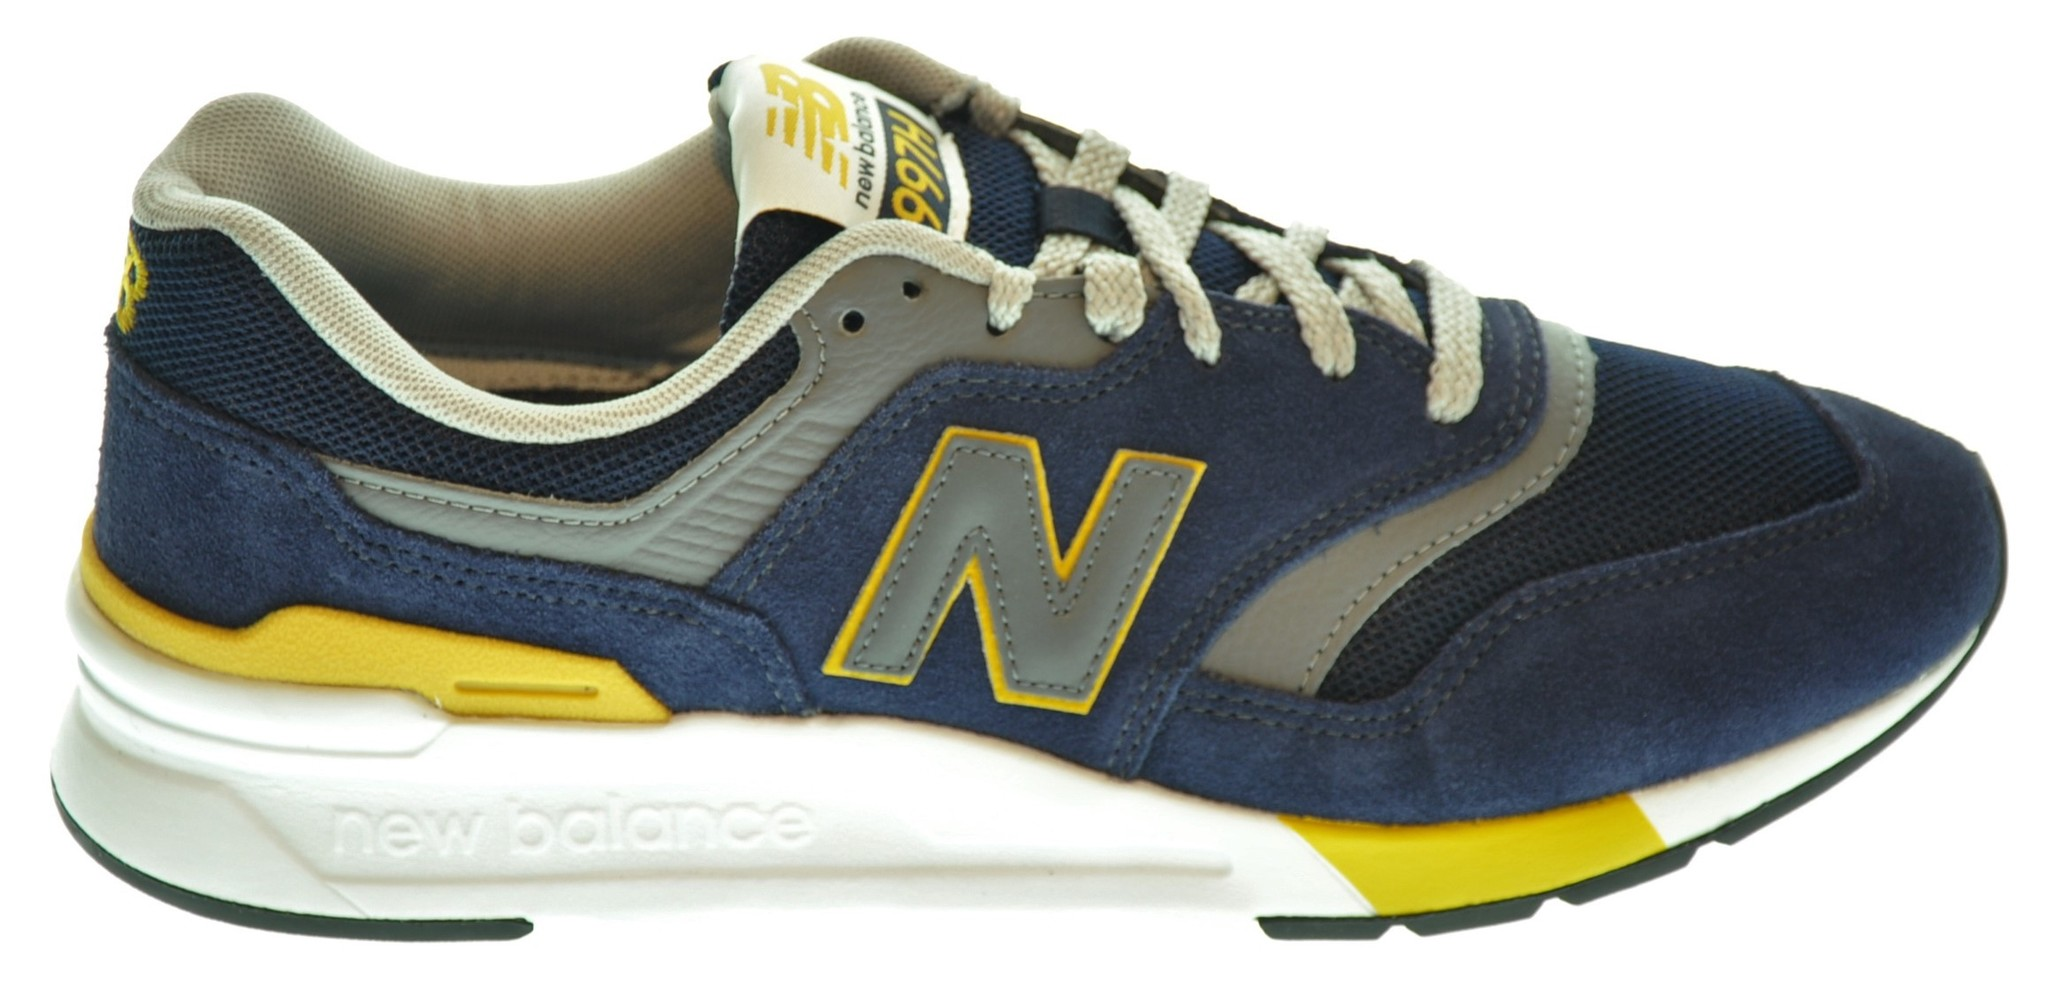 New balance New Balance Sneaker ( 41.5 t/m 46.5 ) 211NEW05